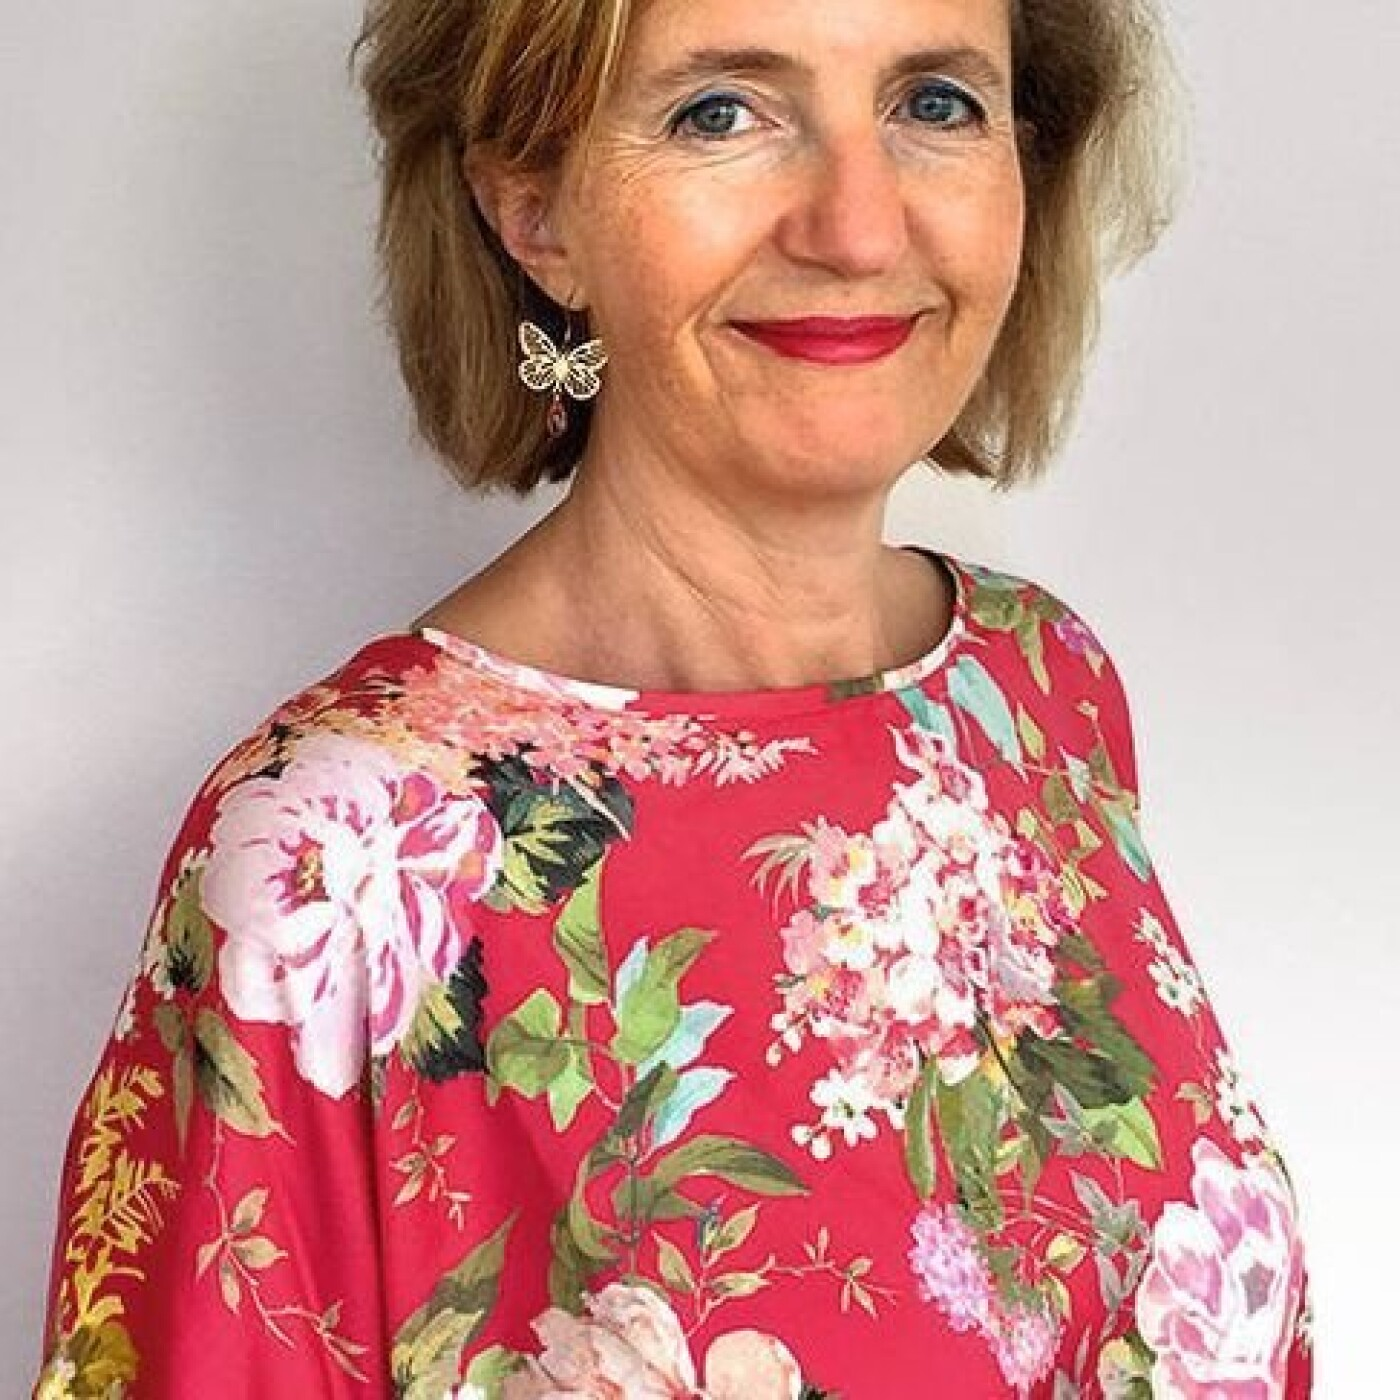 Delphine, directrice des magazines moins de 12 ans Bayard Presse - 02 07 2021 - StereoChic Radio